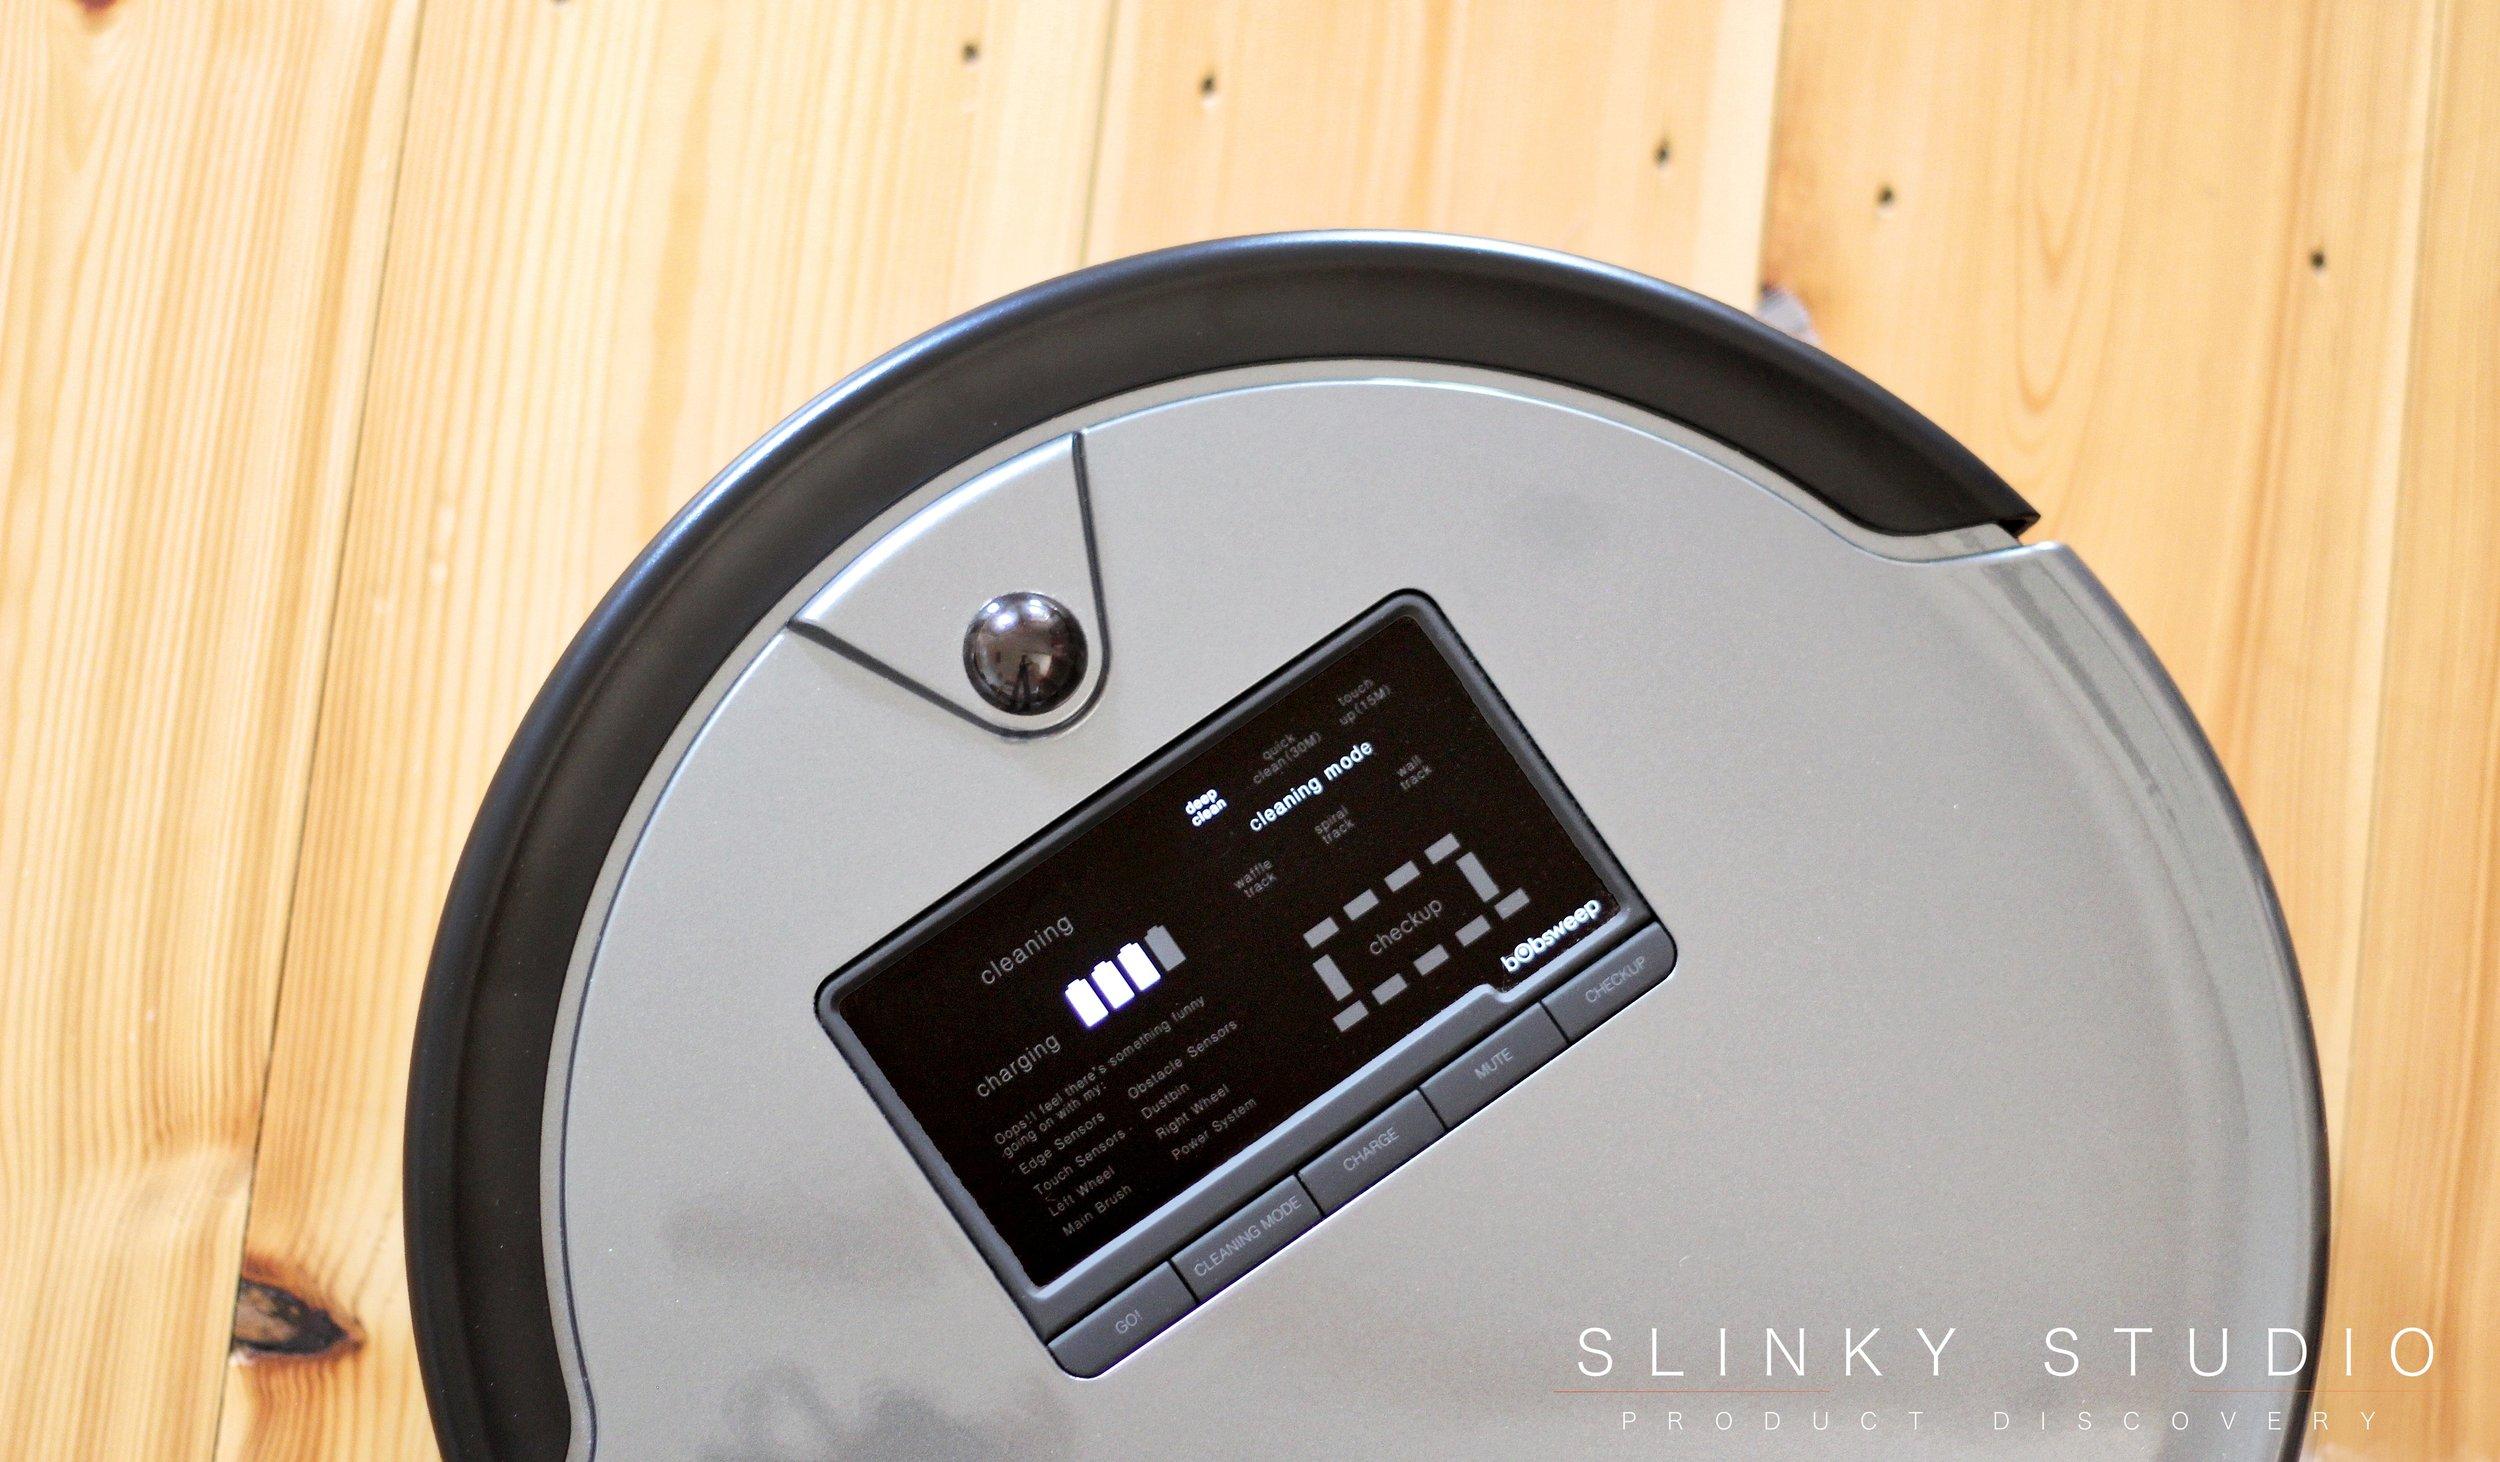 bObsweep PetHair Plus Robot Vacuum Cleaner Above View Controls + Screen.jpg